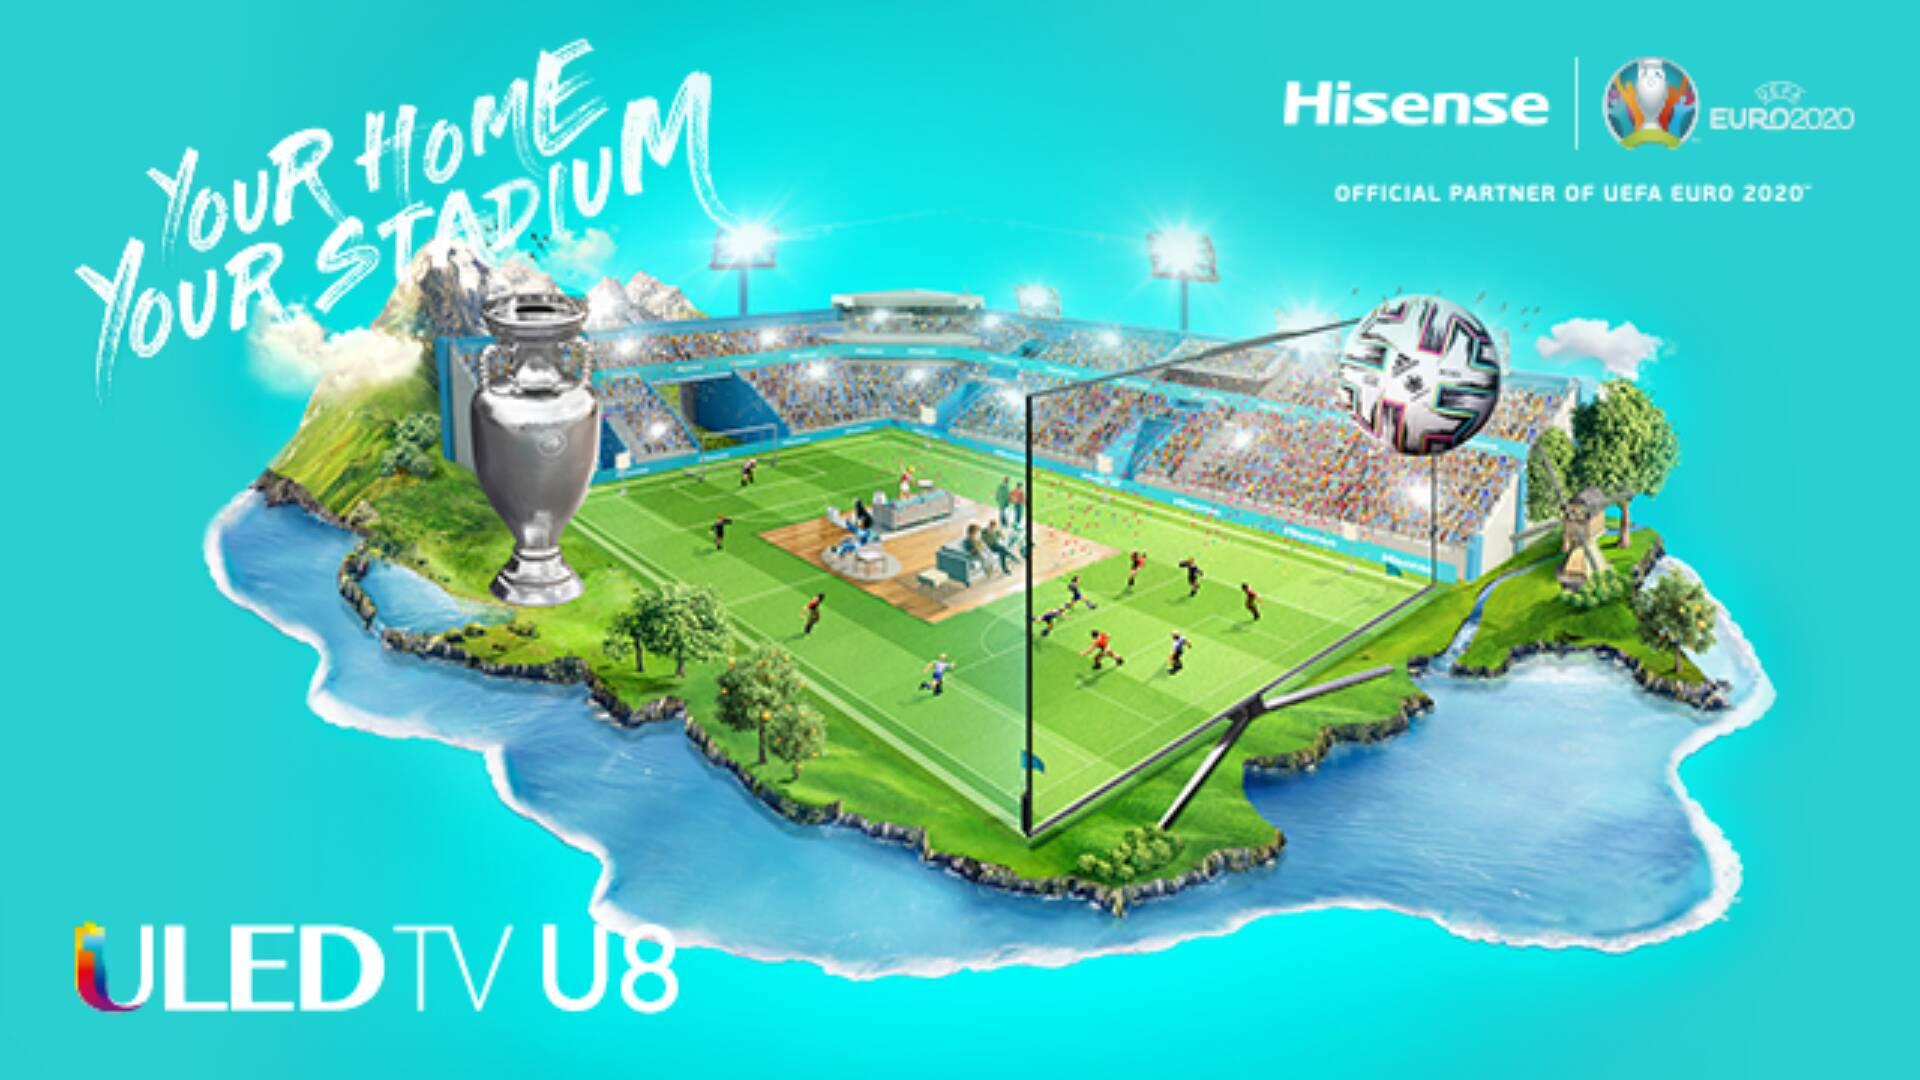 Smart TV Hisense - Euro 2020